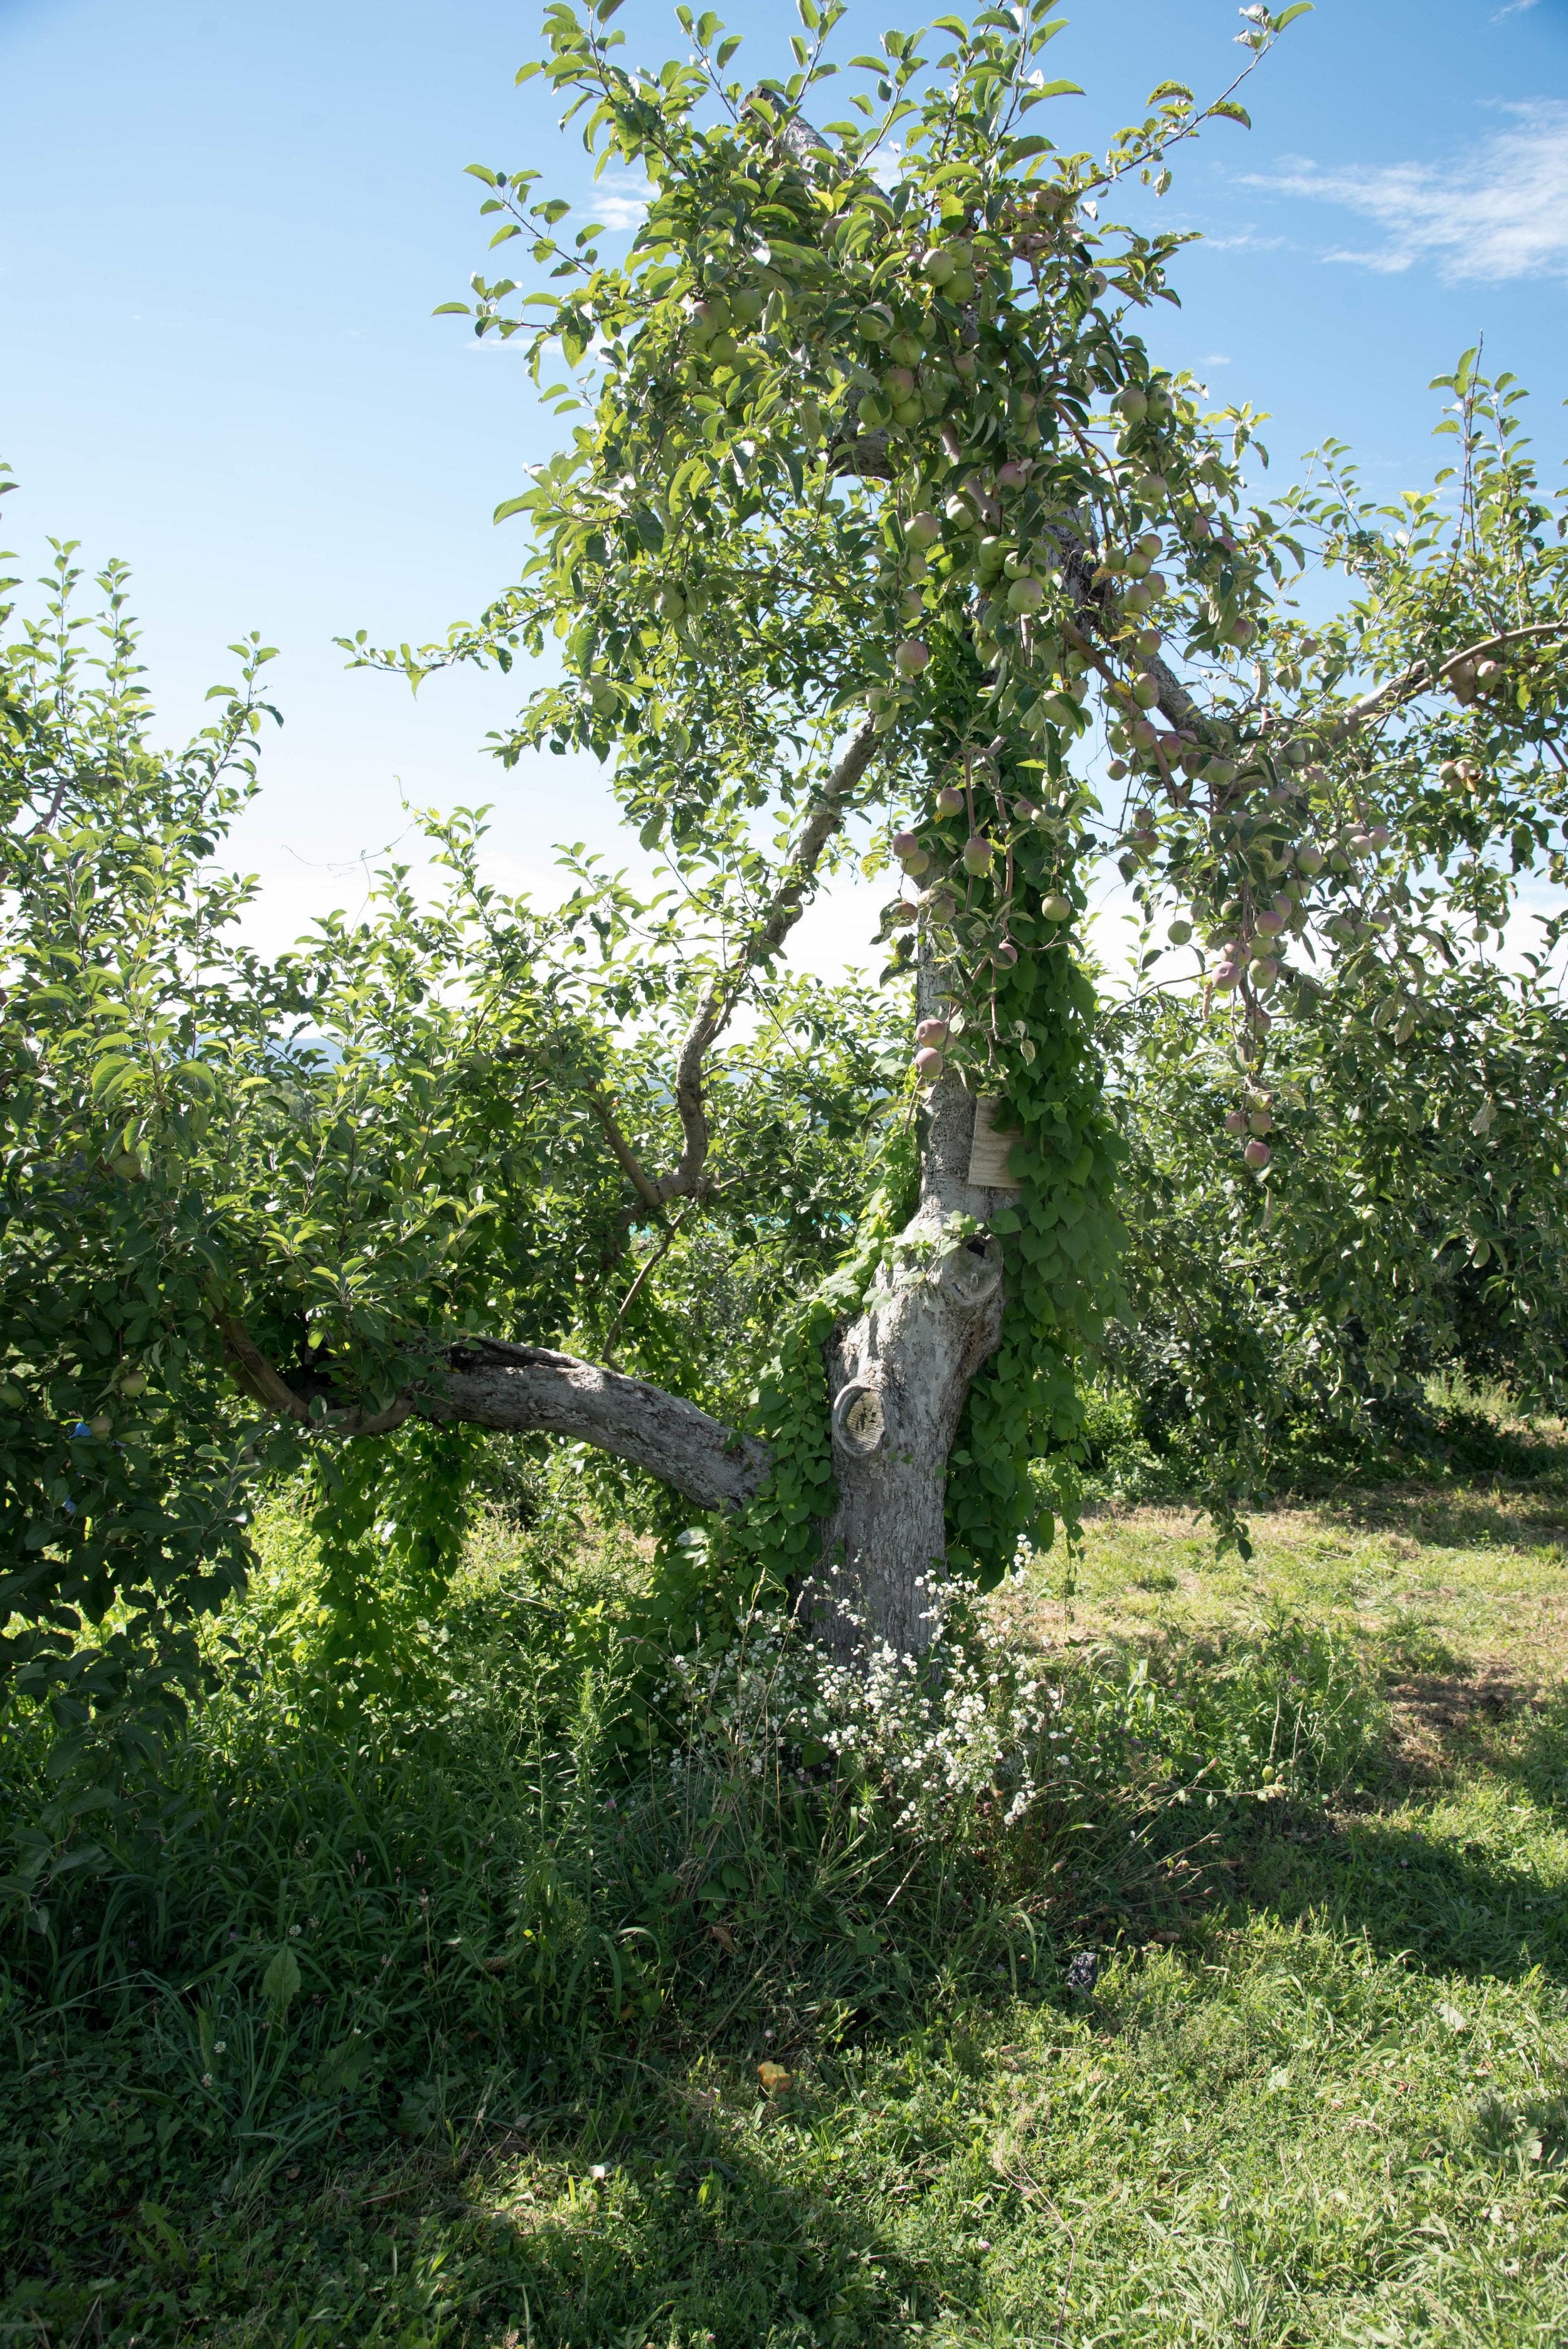 ROSE & IVY Journal Peach Picking and Peach Tart Tartin